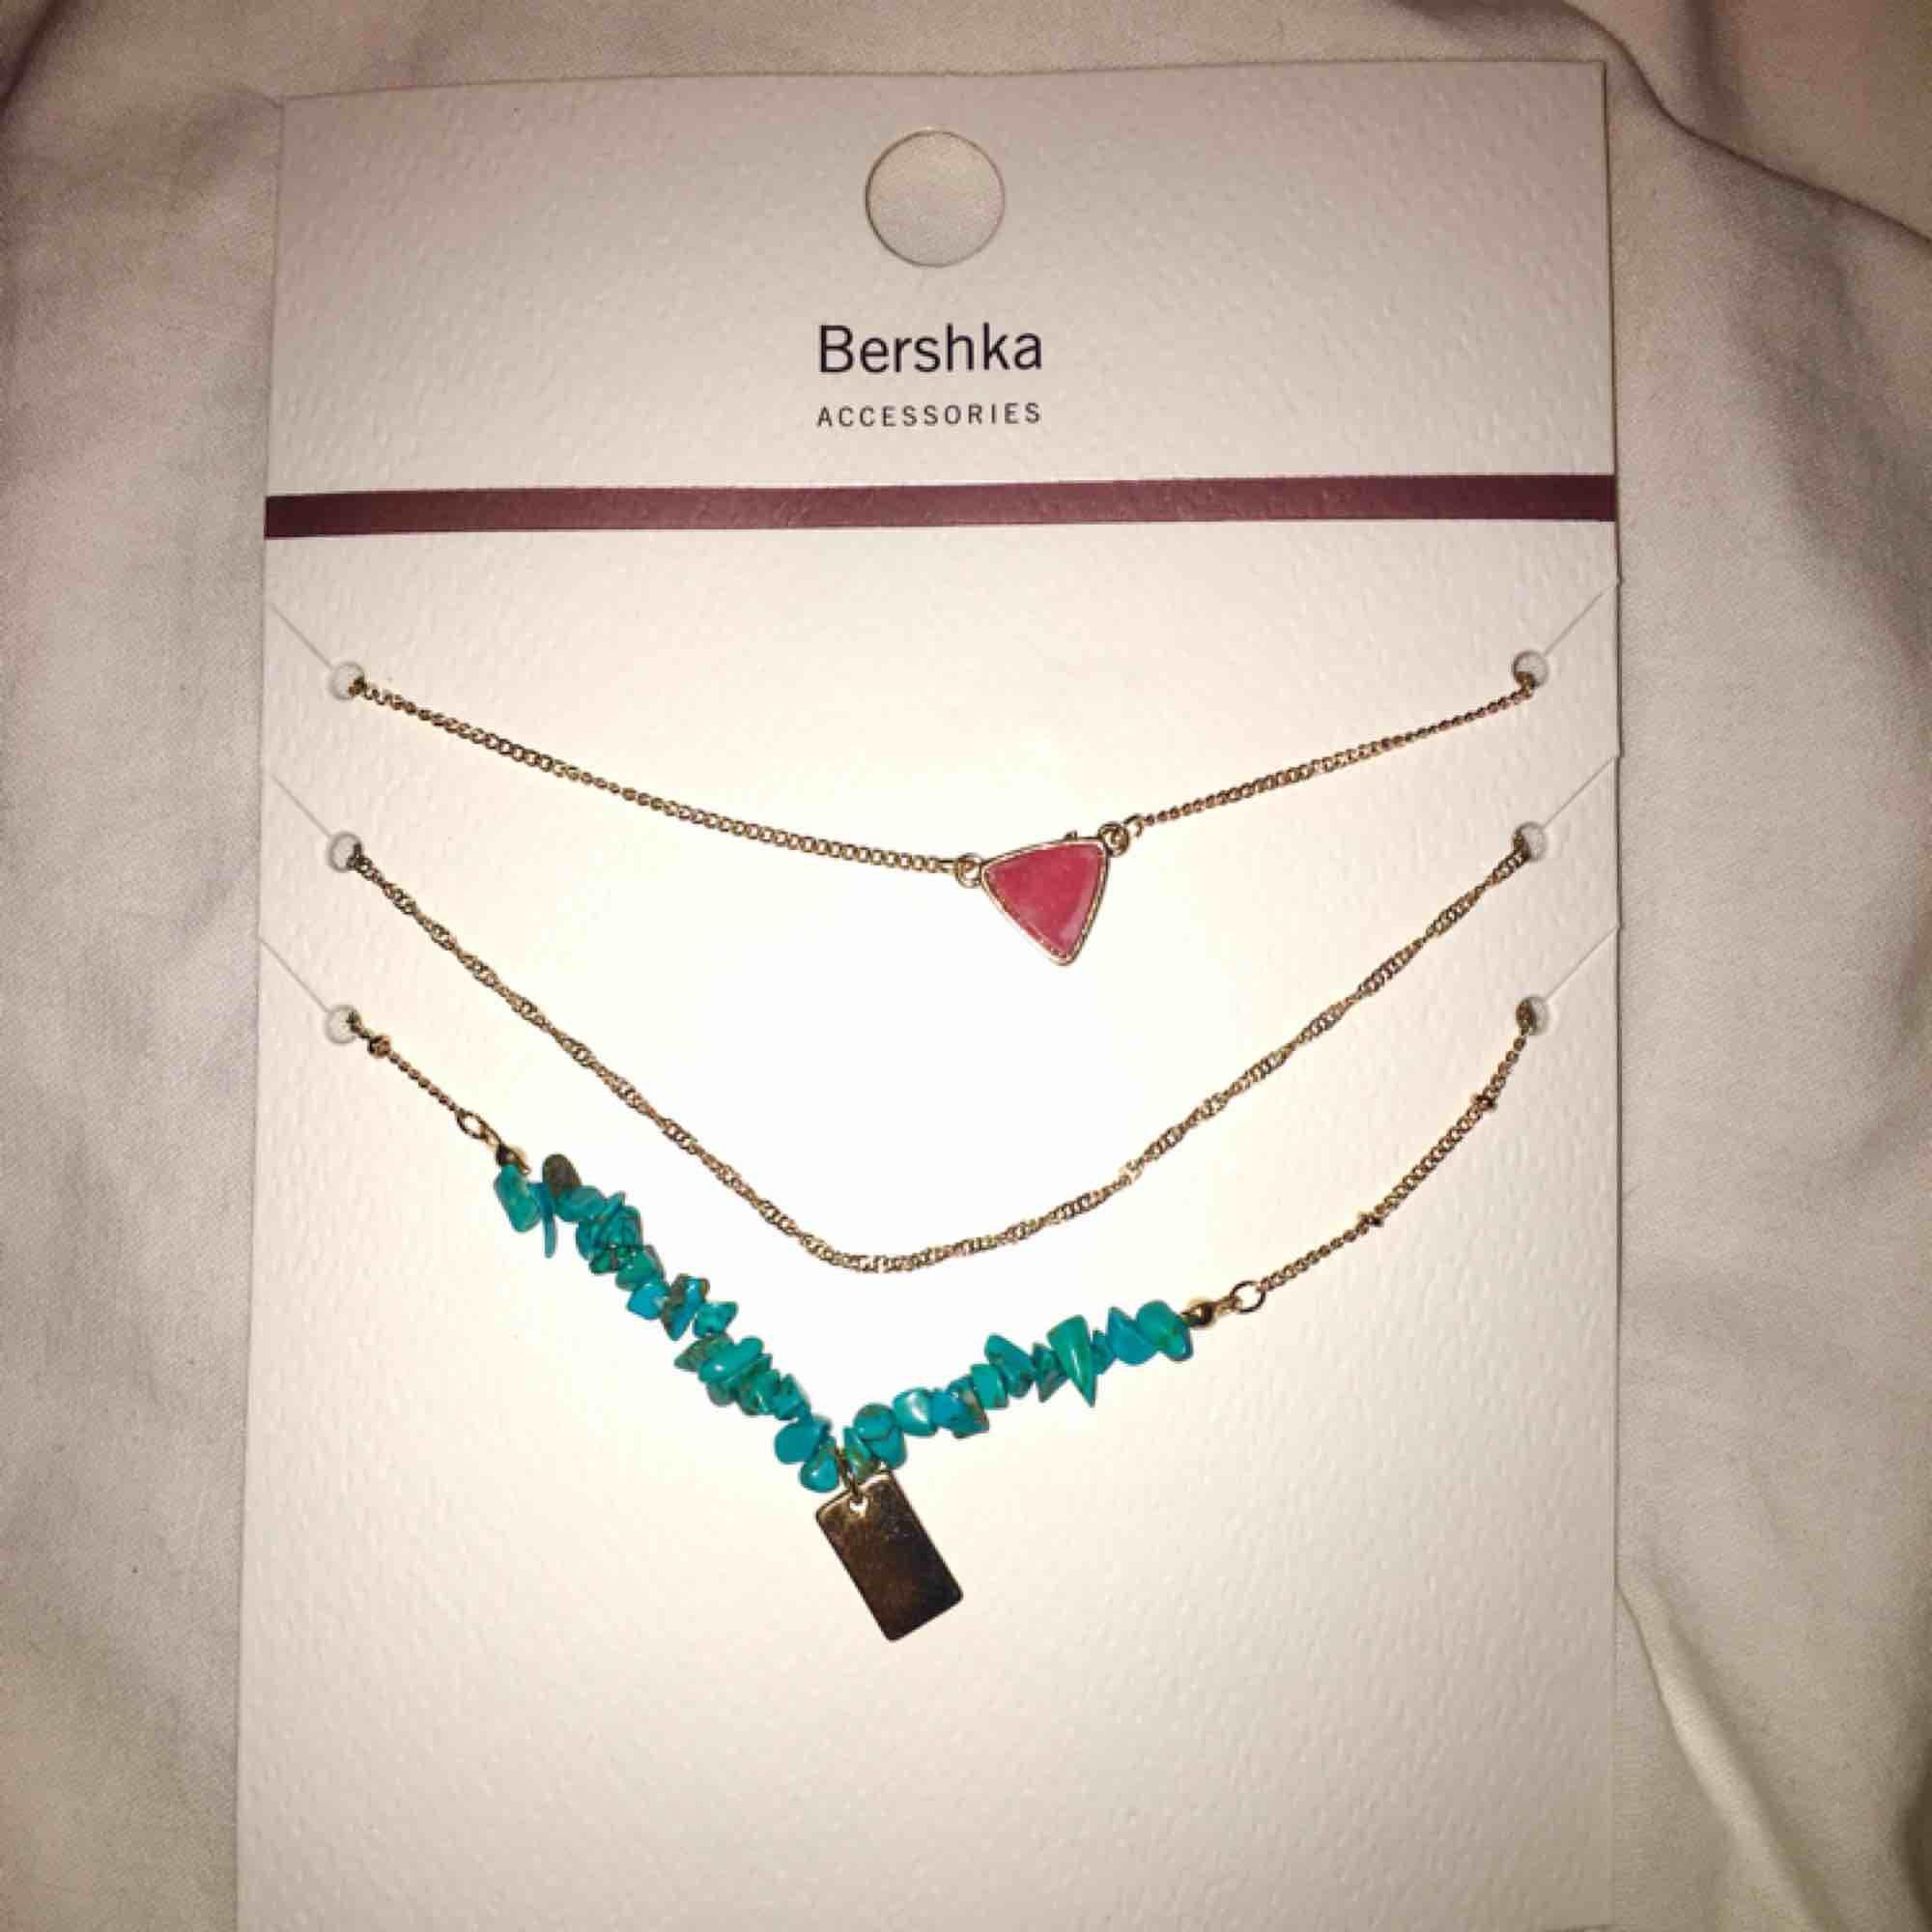 Halsband från bershka. Accessoarer.